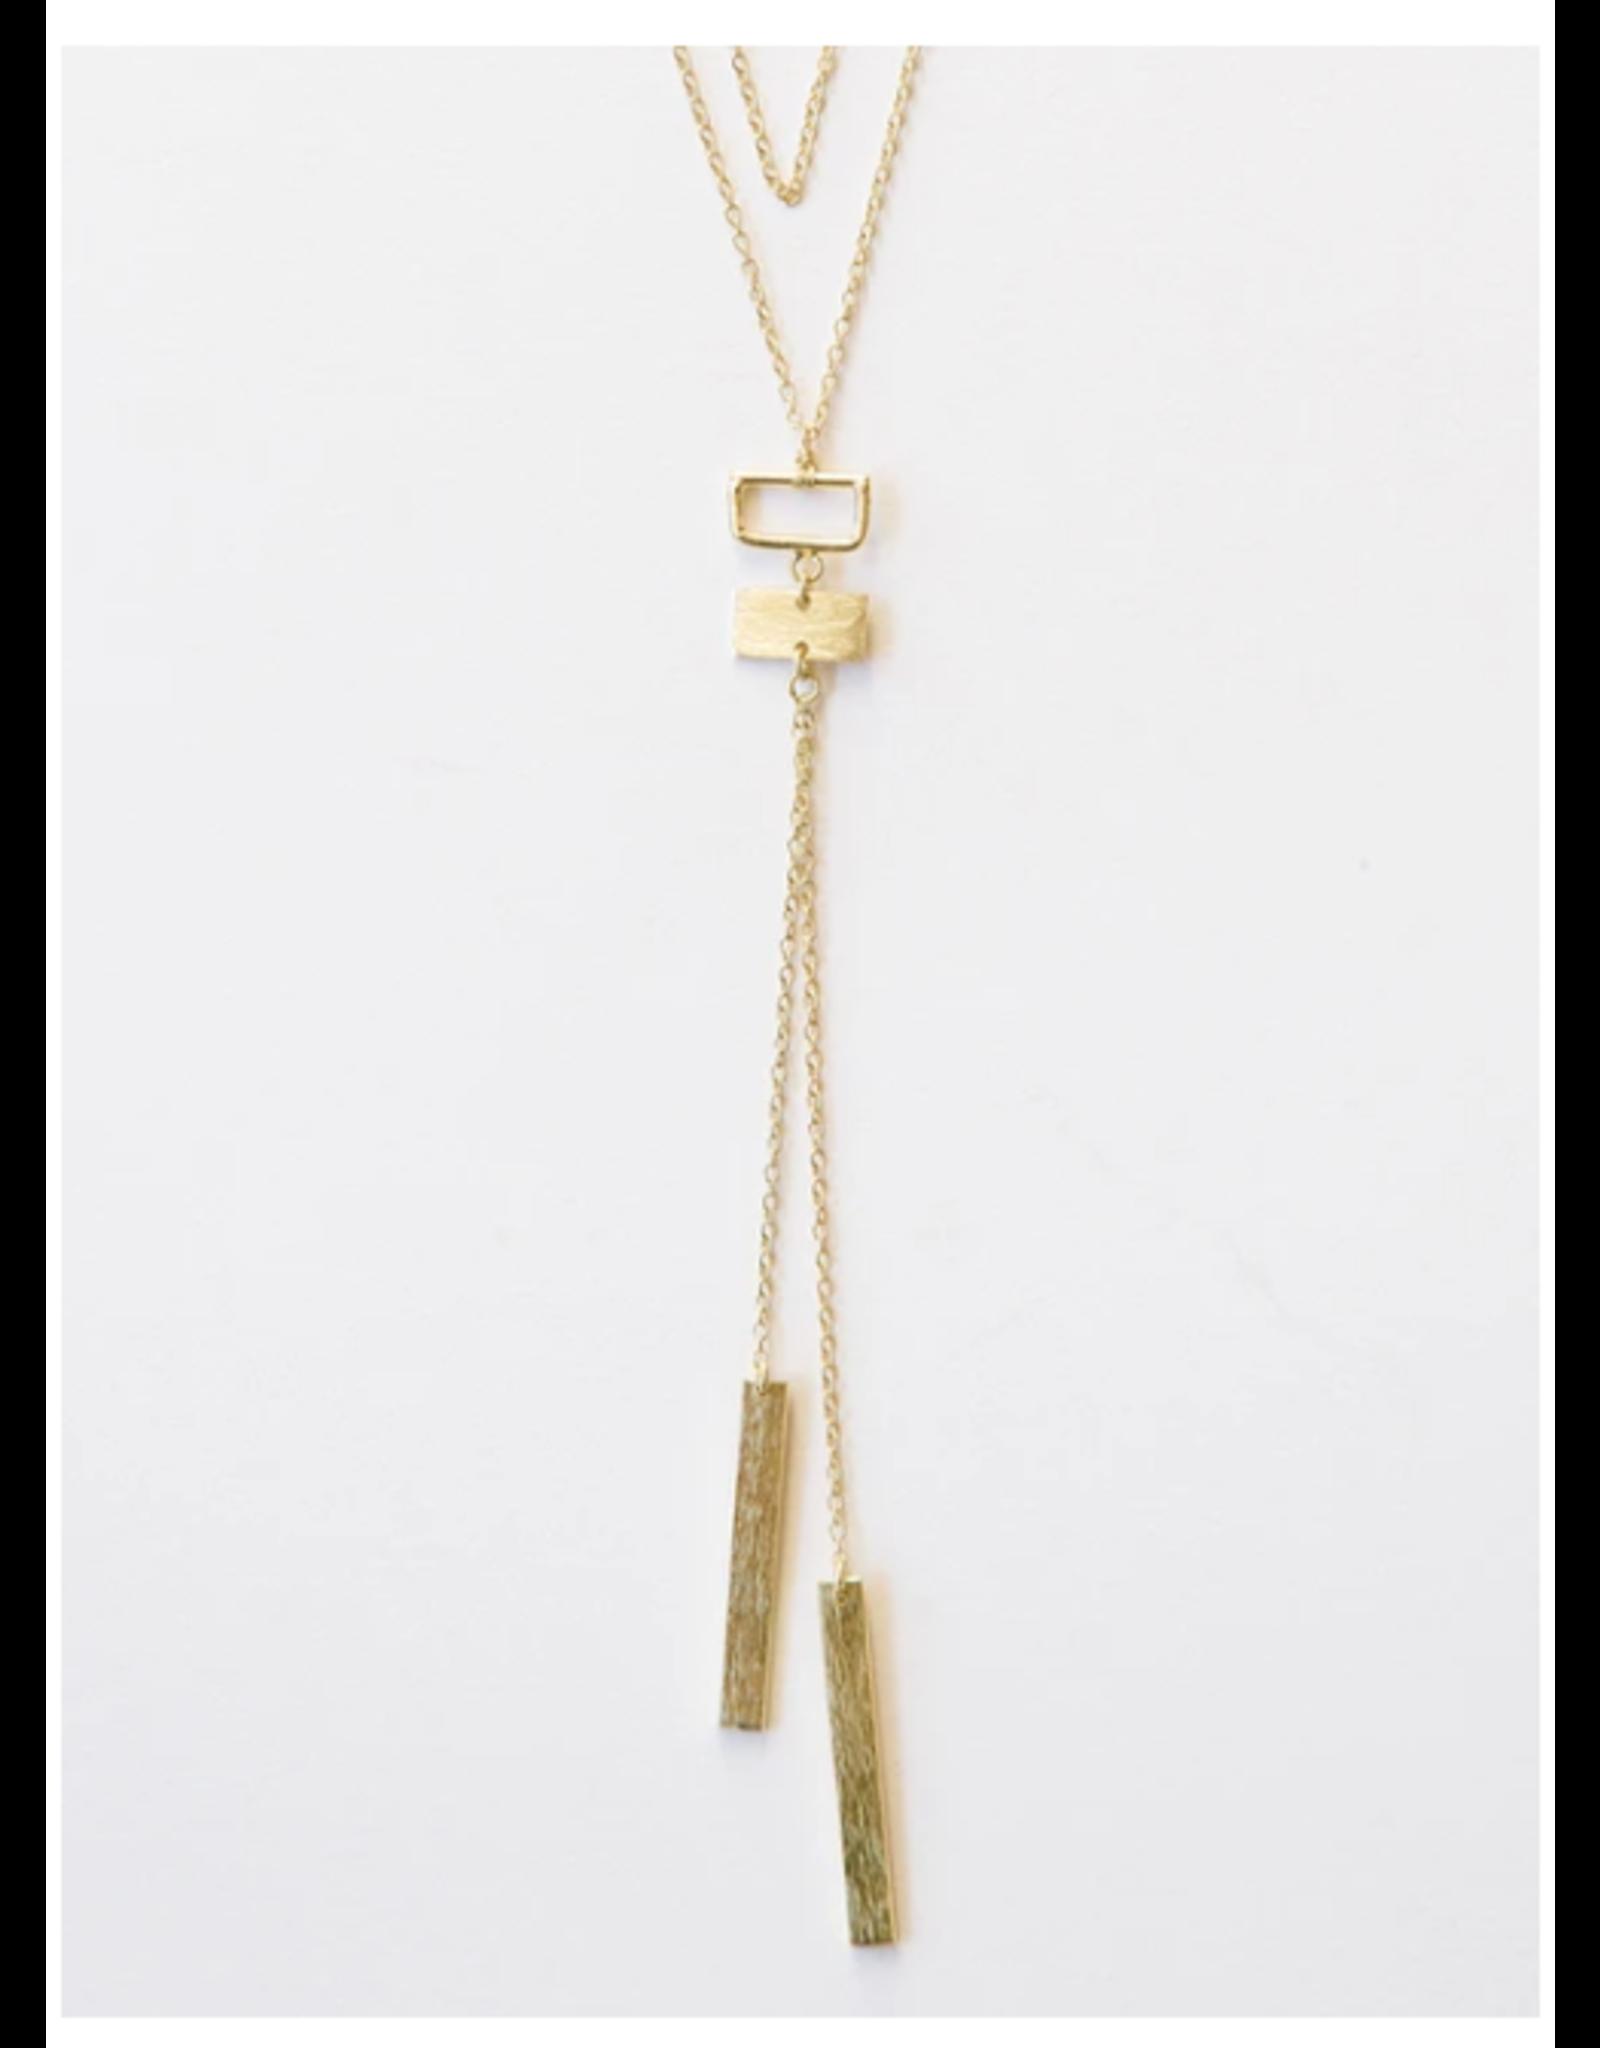 Bolo Necklace Gold, India